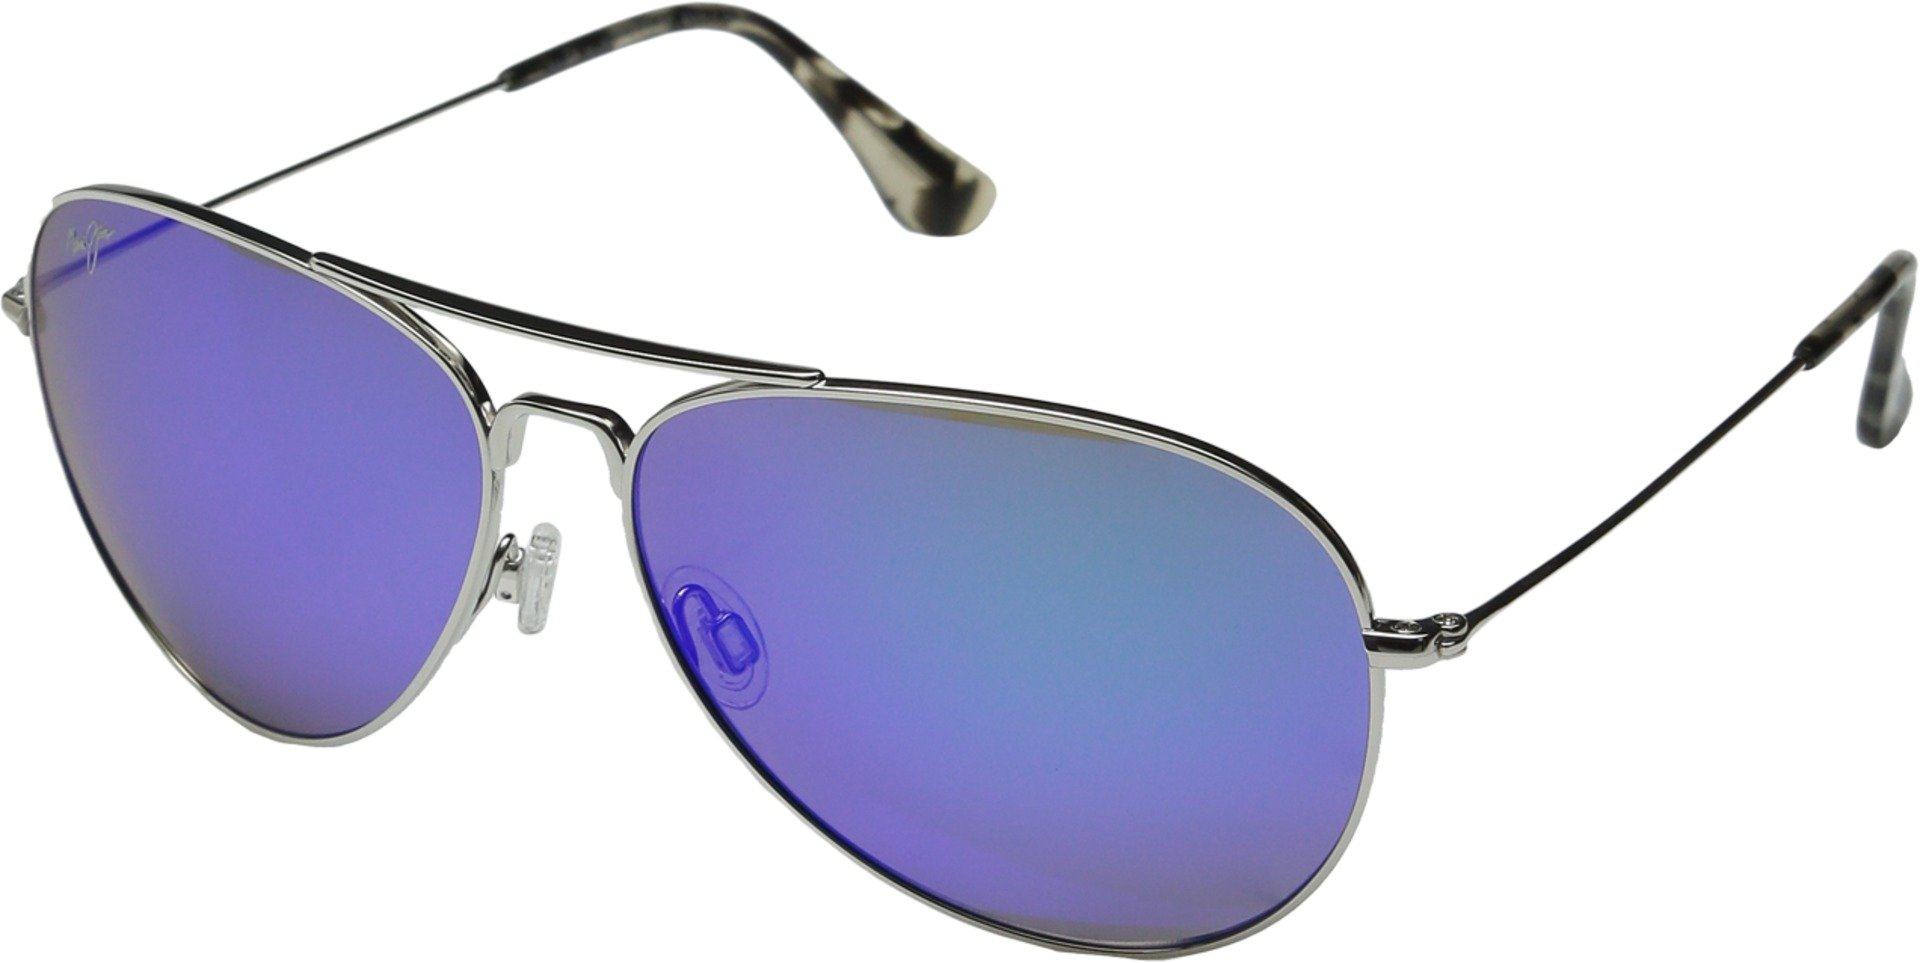 Maui Jim Mavericks Polarized Silver / Blue Hawaii Sunglasses